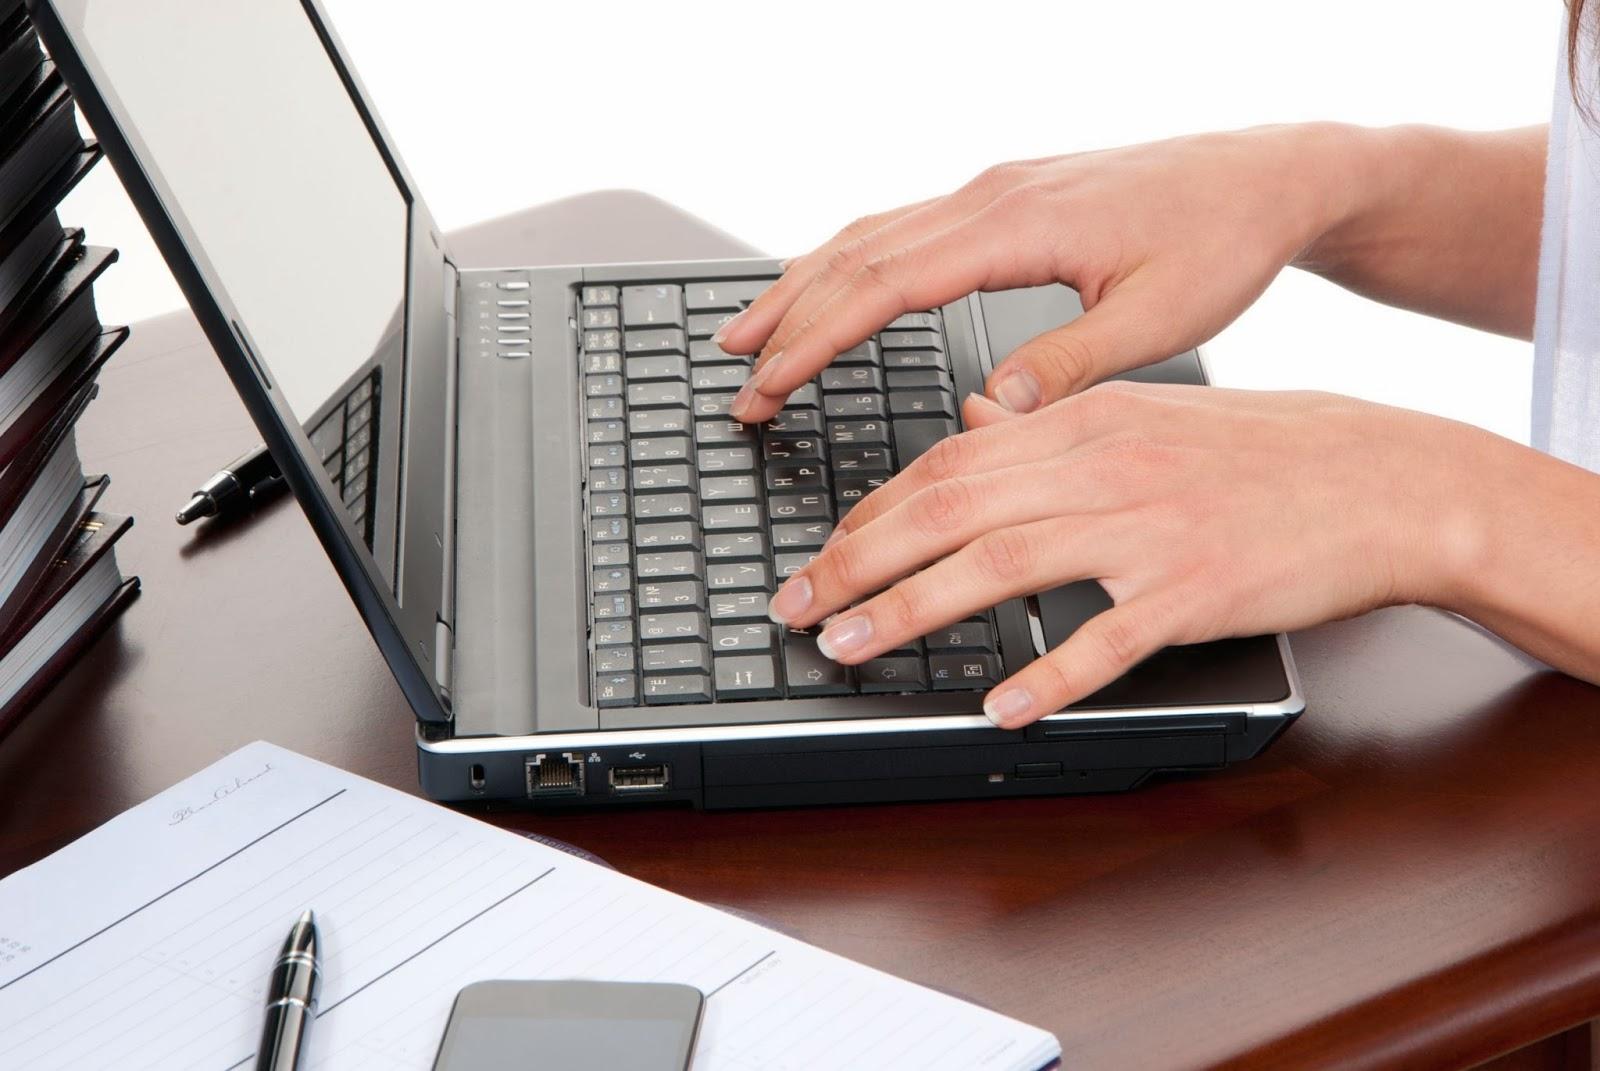 заработок на копирайтинге онлайн